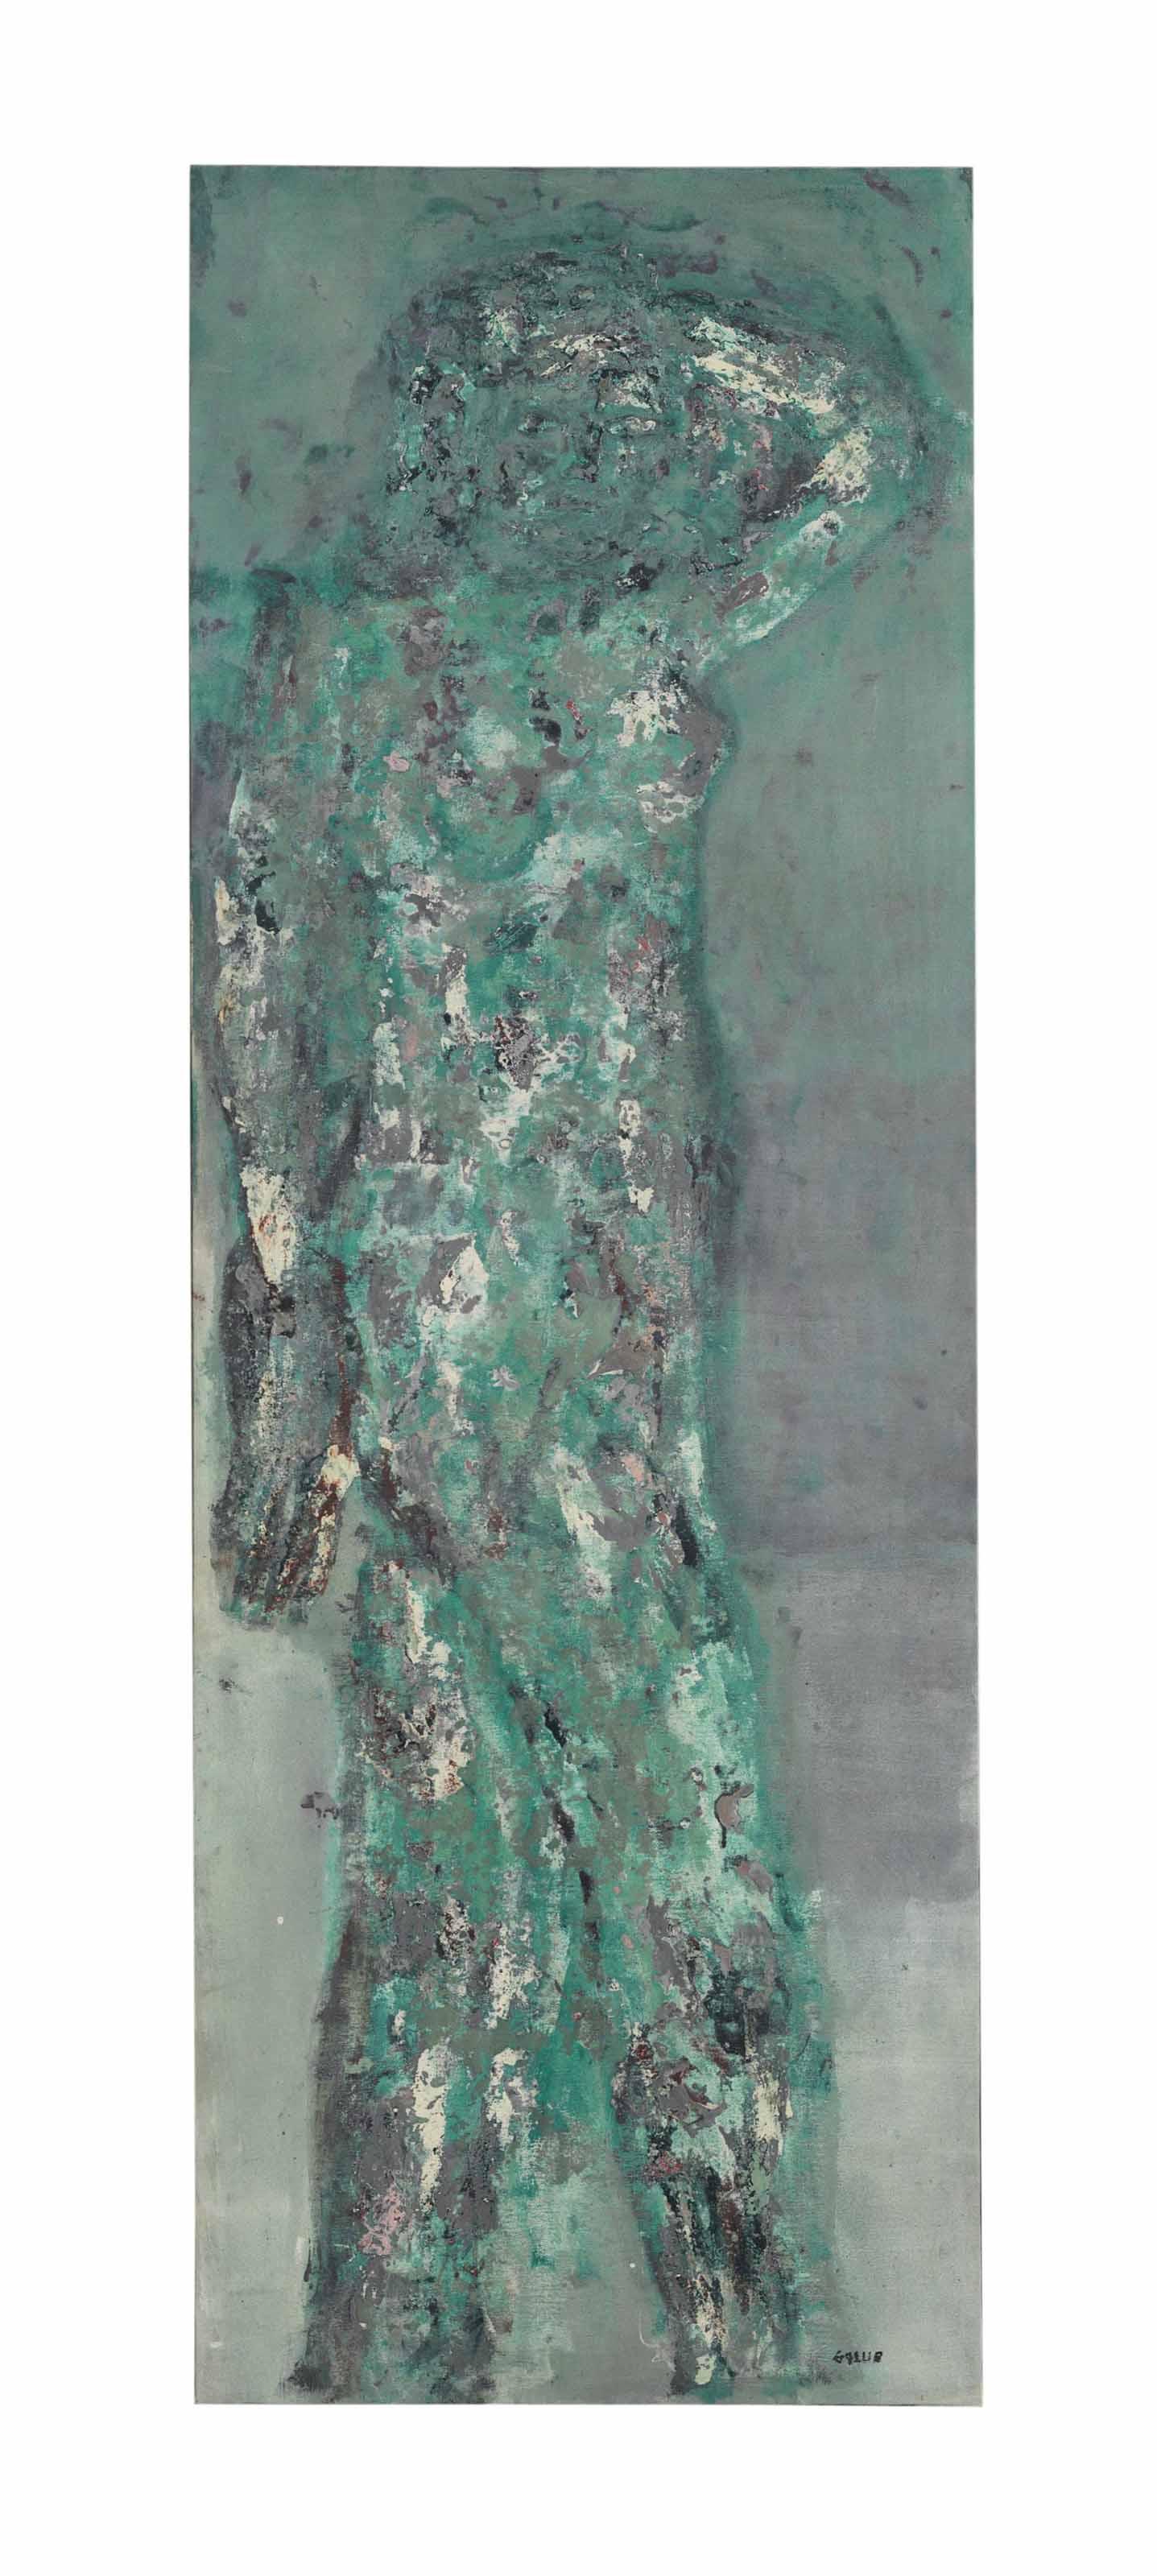 Portrait of Iris Clert